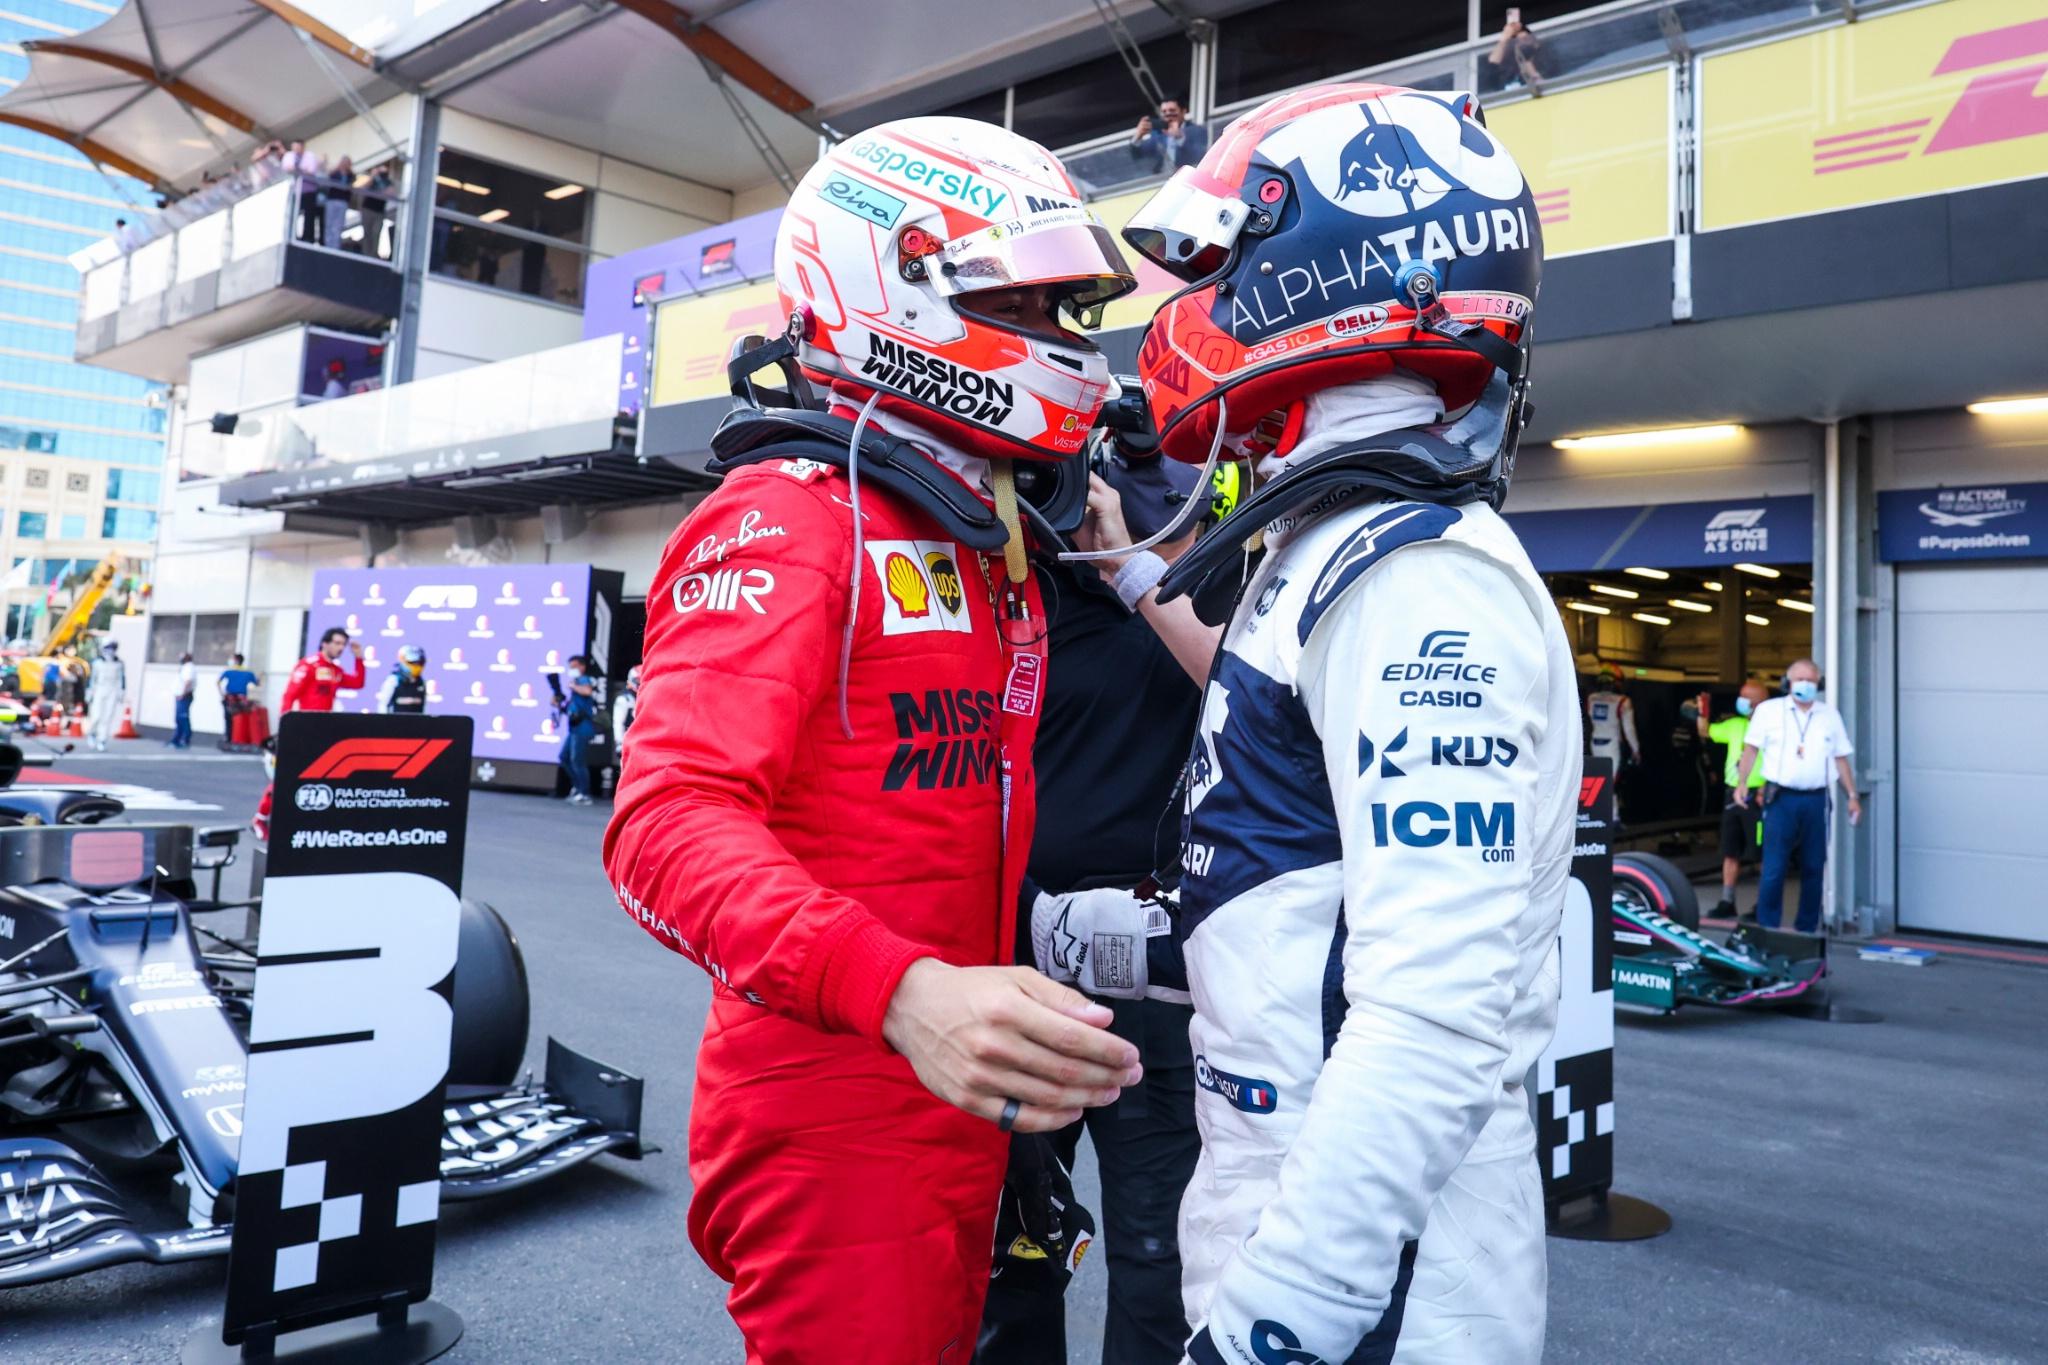 (L to R): Charles Leclerc (MON) Ferrari congratulates Pierre Gasly (FRA) AlphaTauri on his third place in parc ferme.